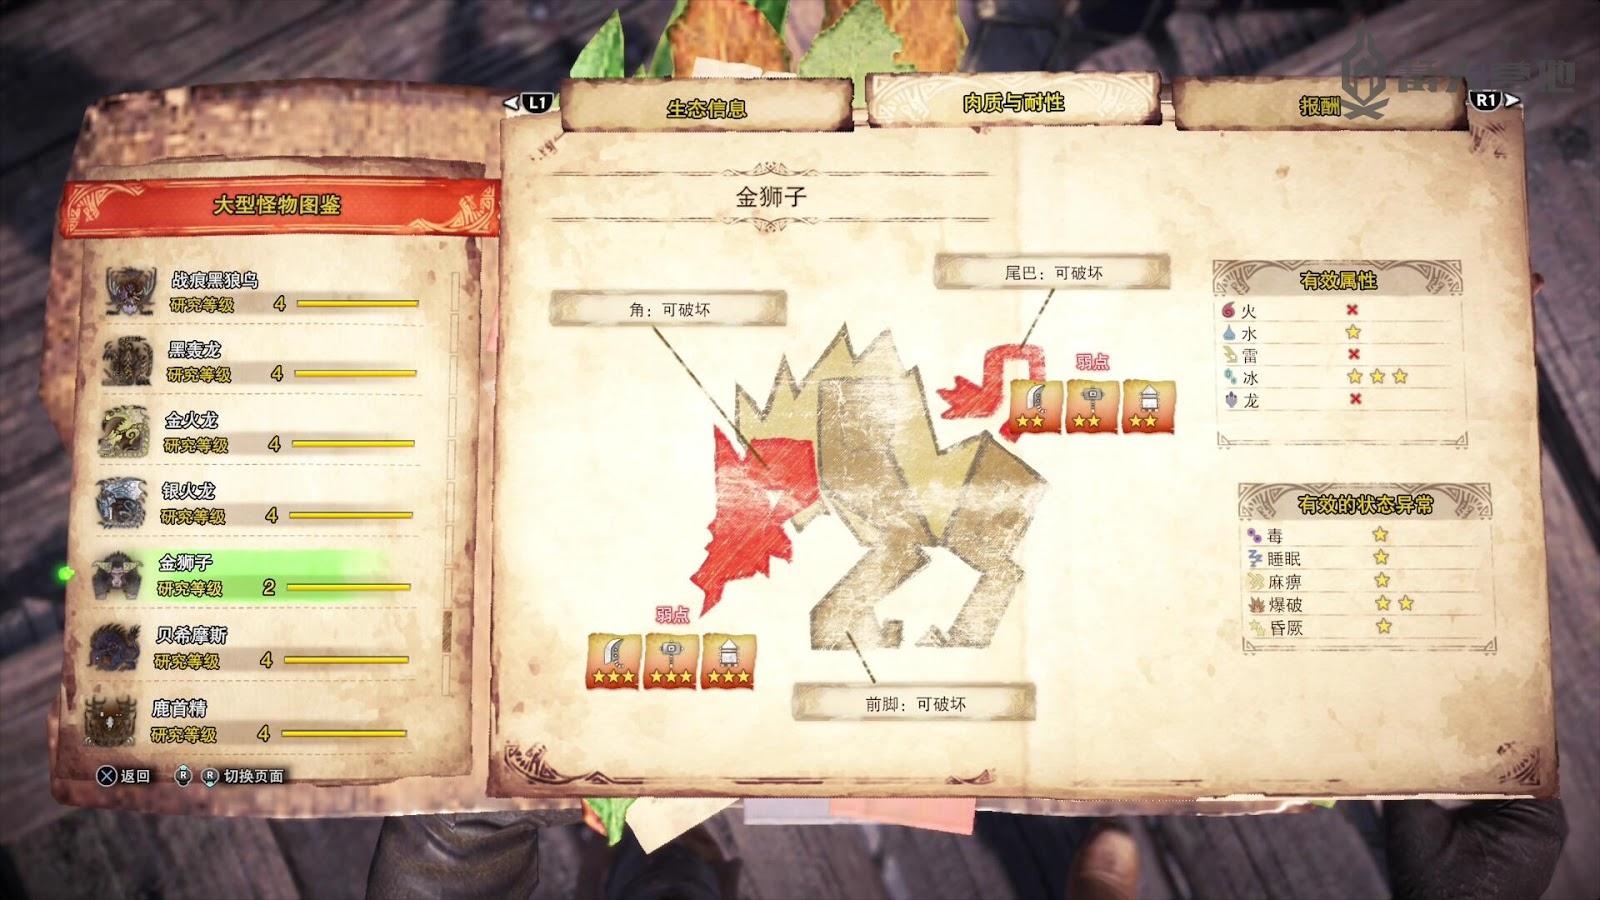 mhw Iceborne 金獅子屬性弱點攻略 - 魔物獵人 世界 Monster Hunter World 遊戲世界